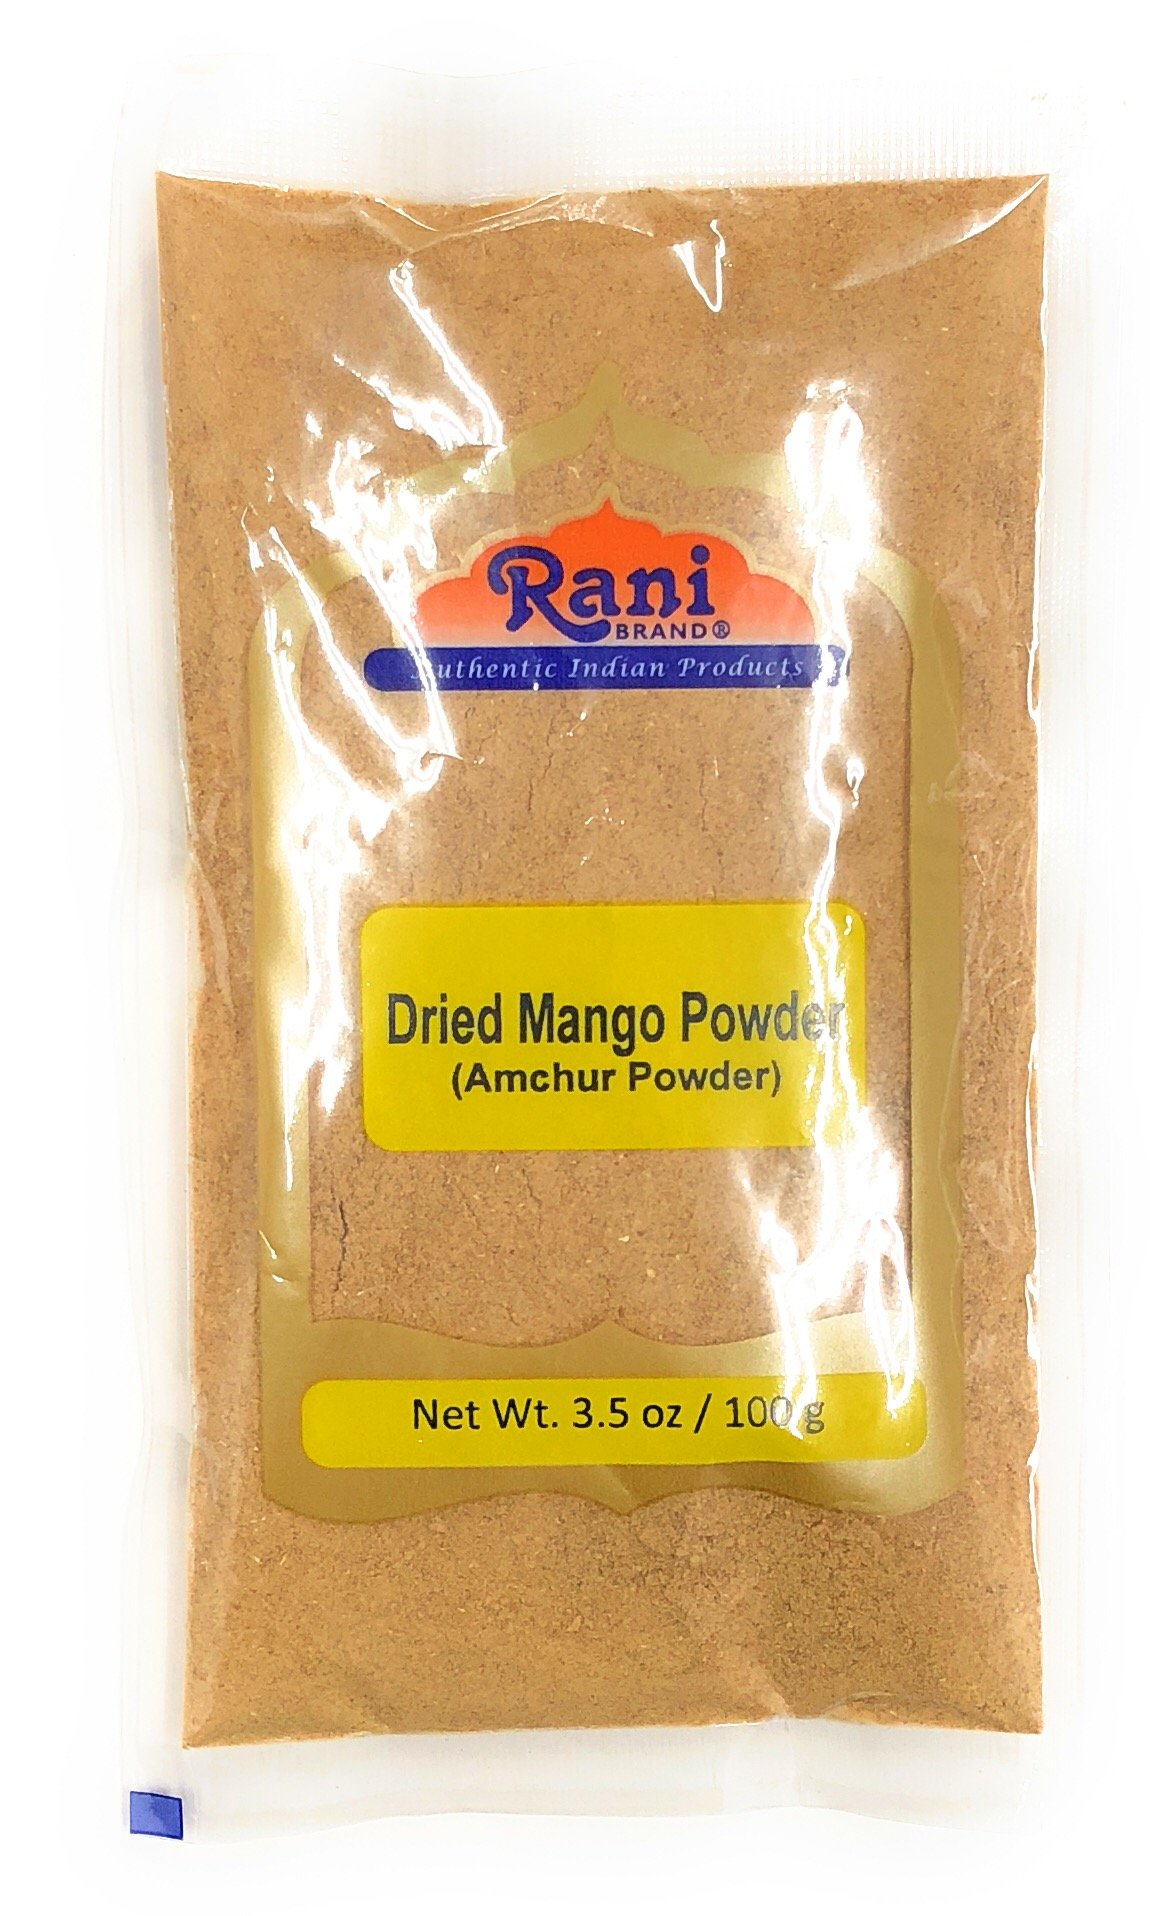 Rani Amchur (Mango) Ground Powder Spice 3.5oz (100gm) ~ All Natural, Indian Origin | No Color | Gluten Free Ingredients | Vegan | NON-GMO | No Salt or fillers